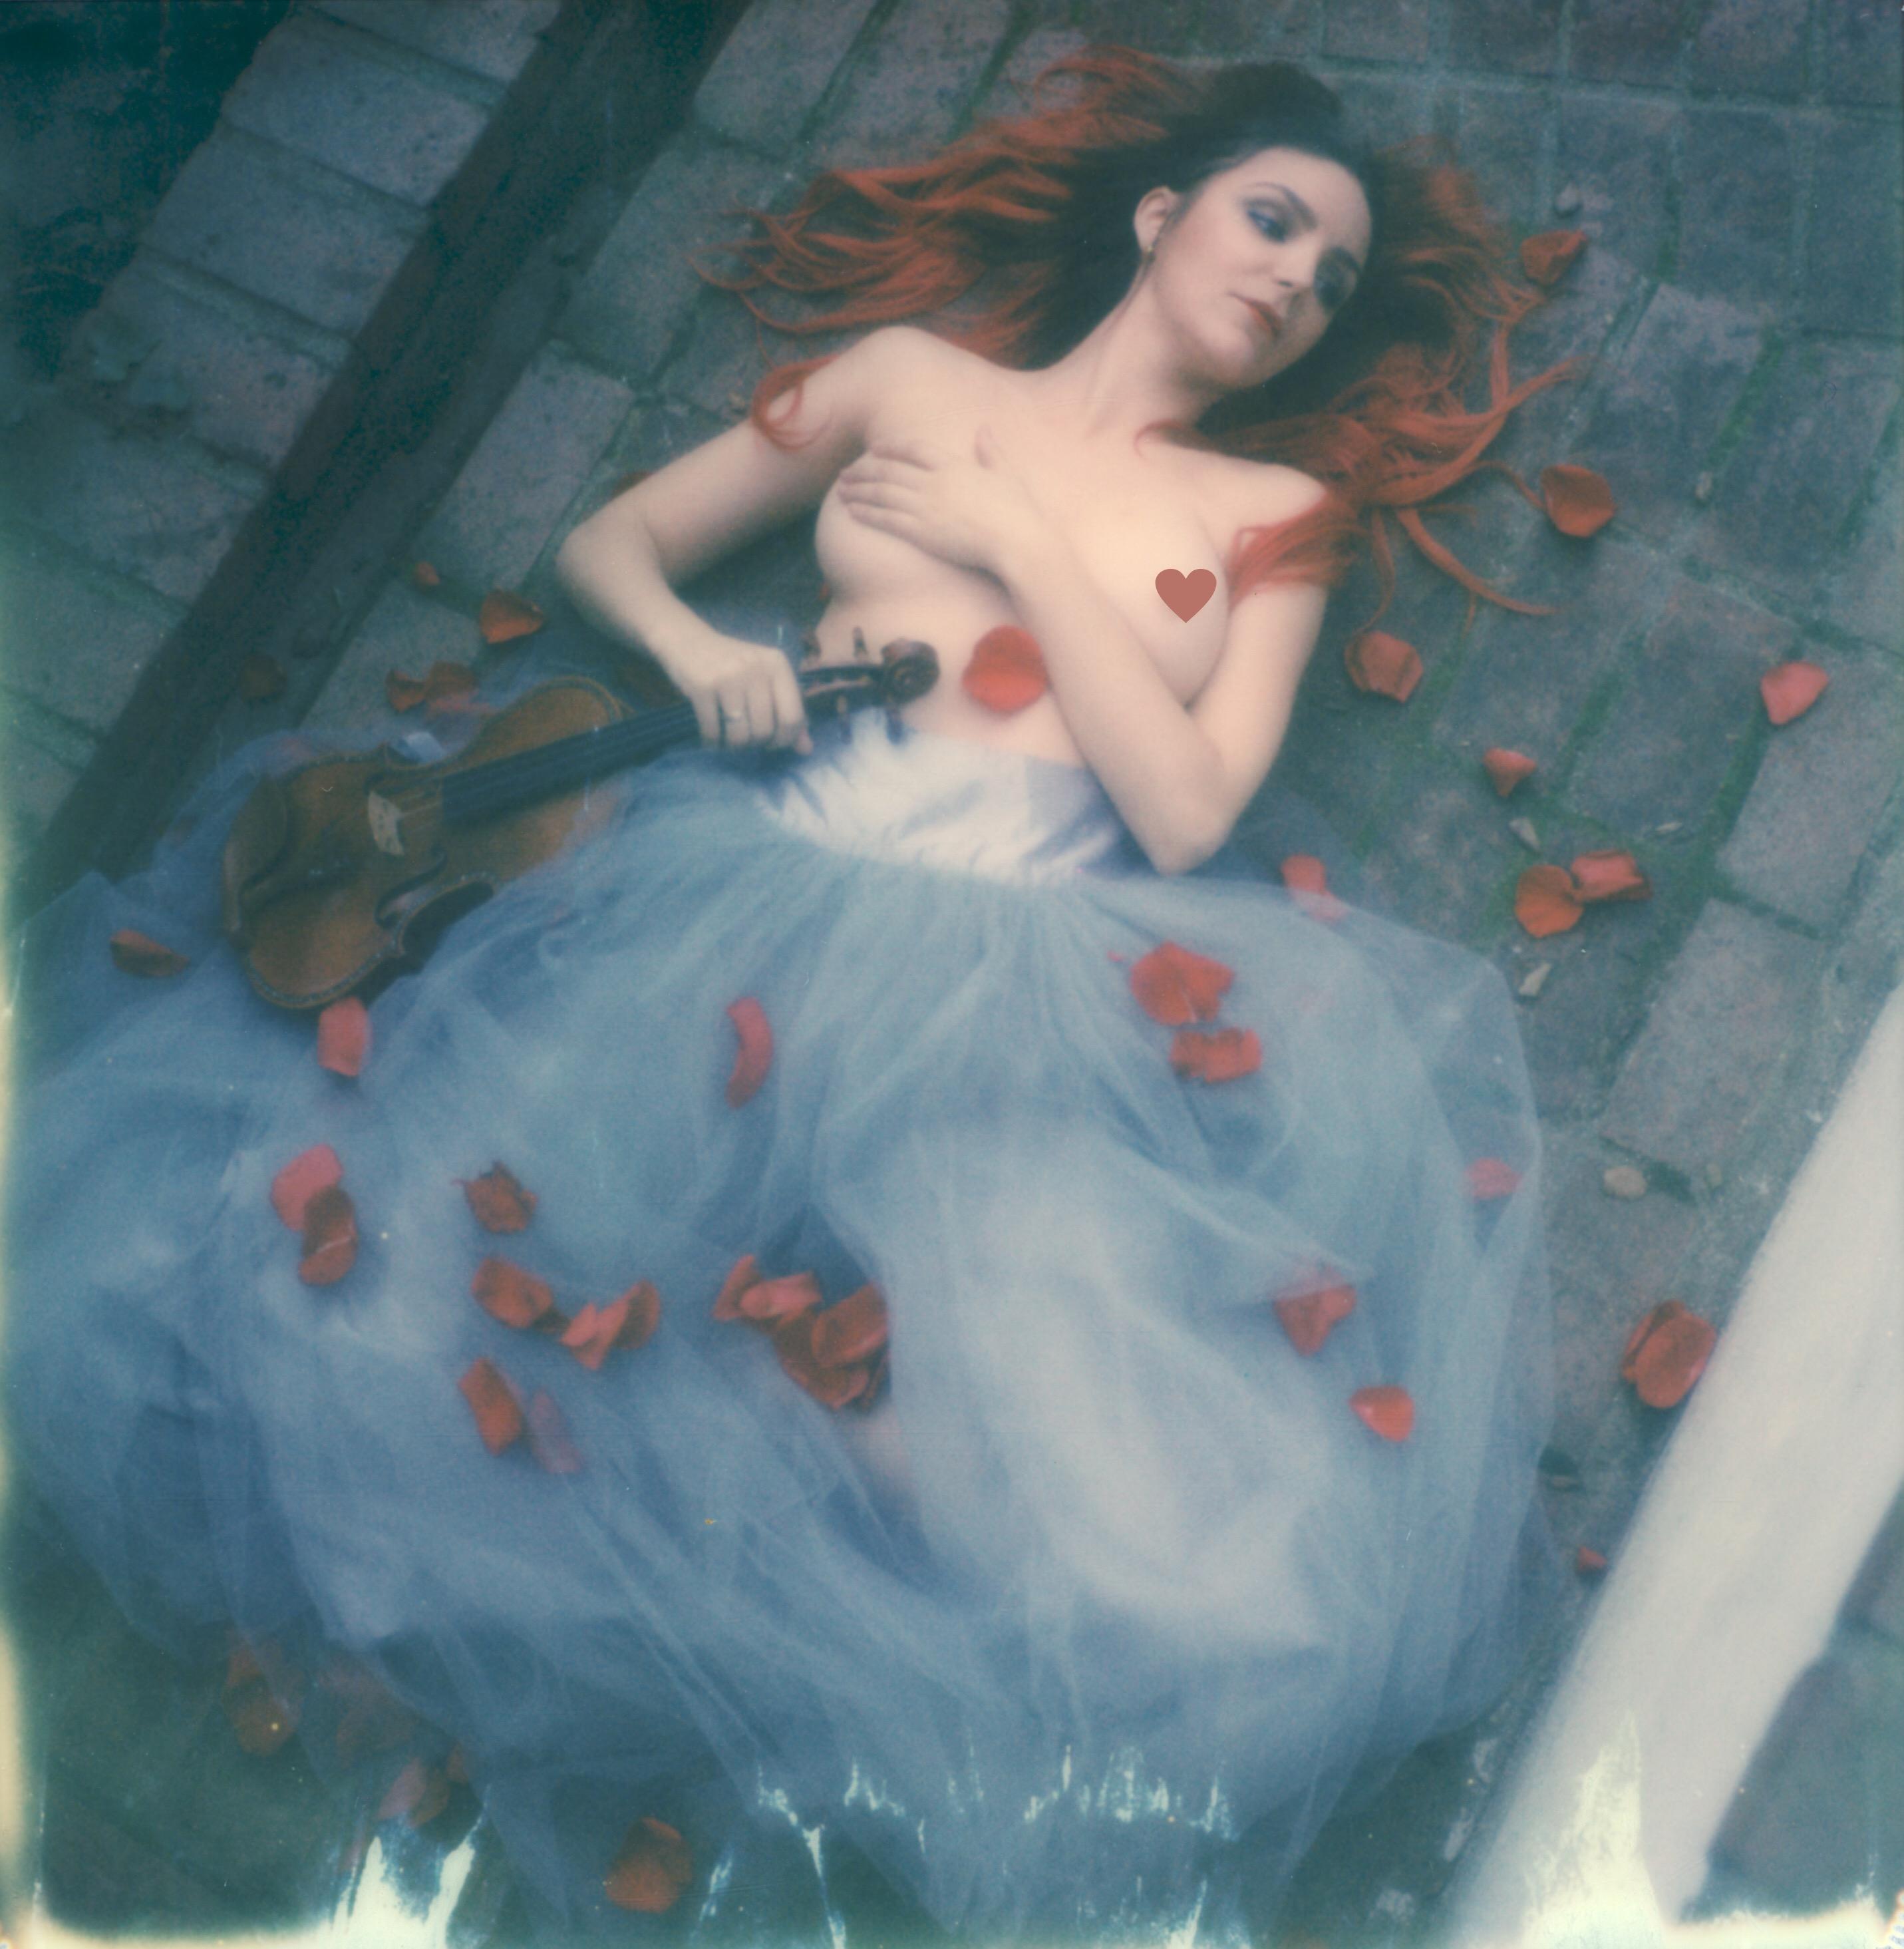 polaroid-impossible-project-violin-laurel-canyon-fashion-blogger-instant-film-vintage-violin-bohemian-valentines-day-photo-shoot-18